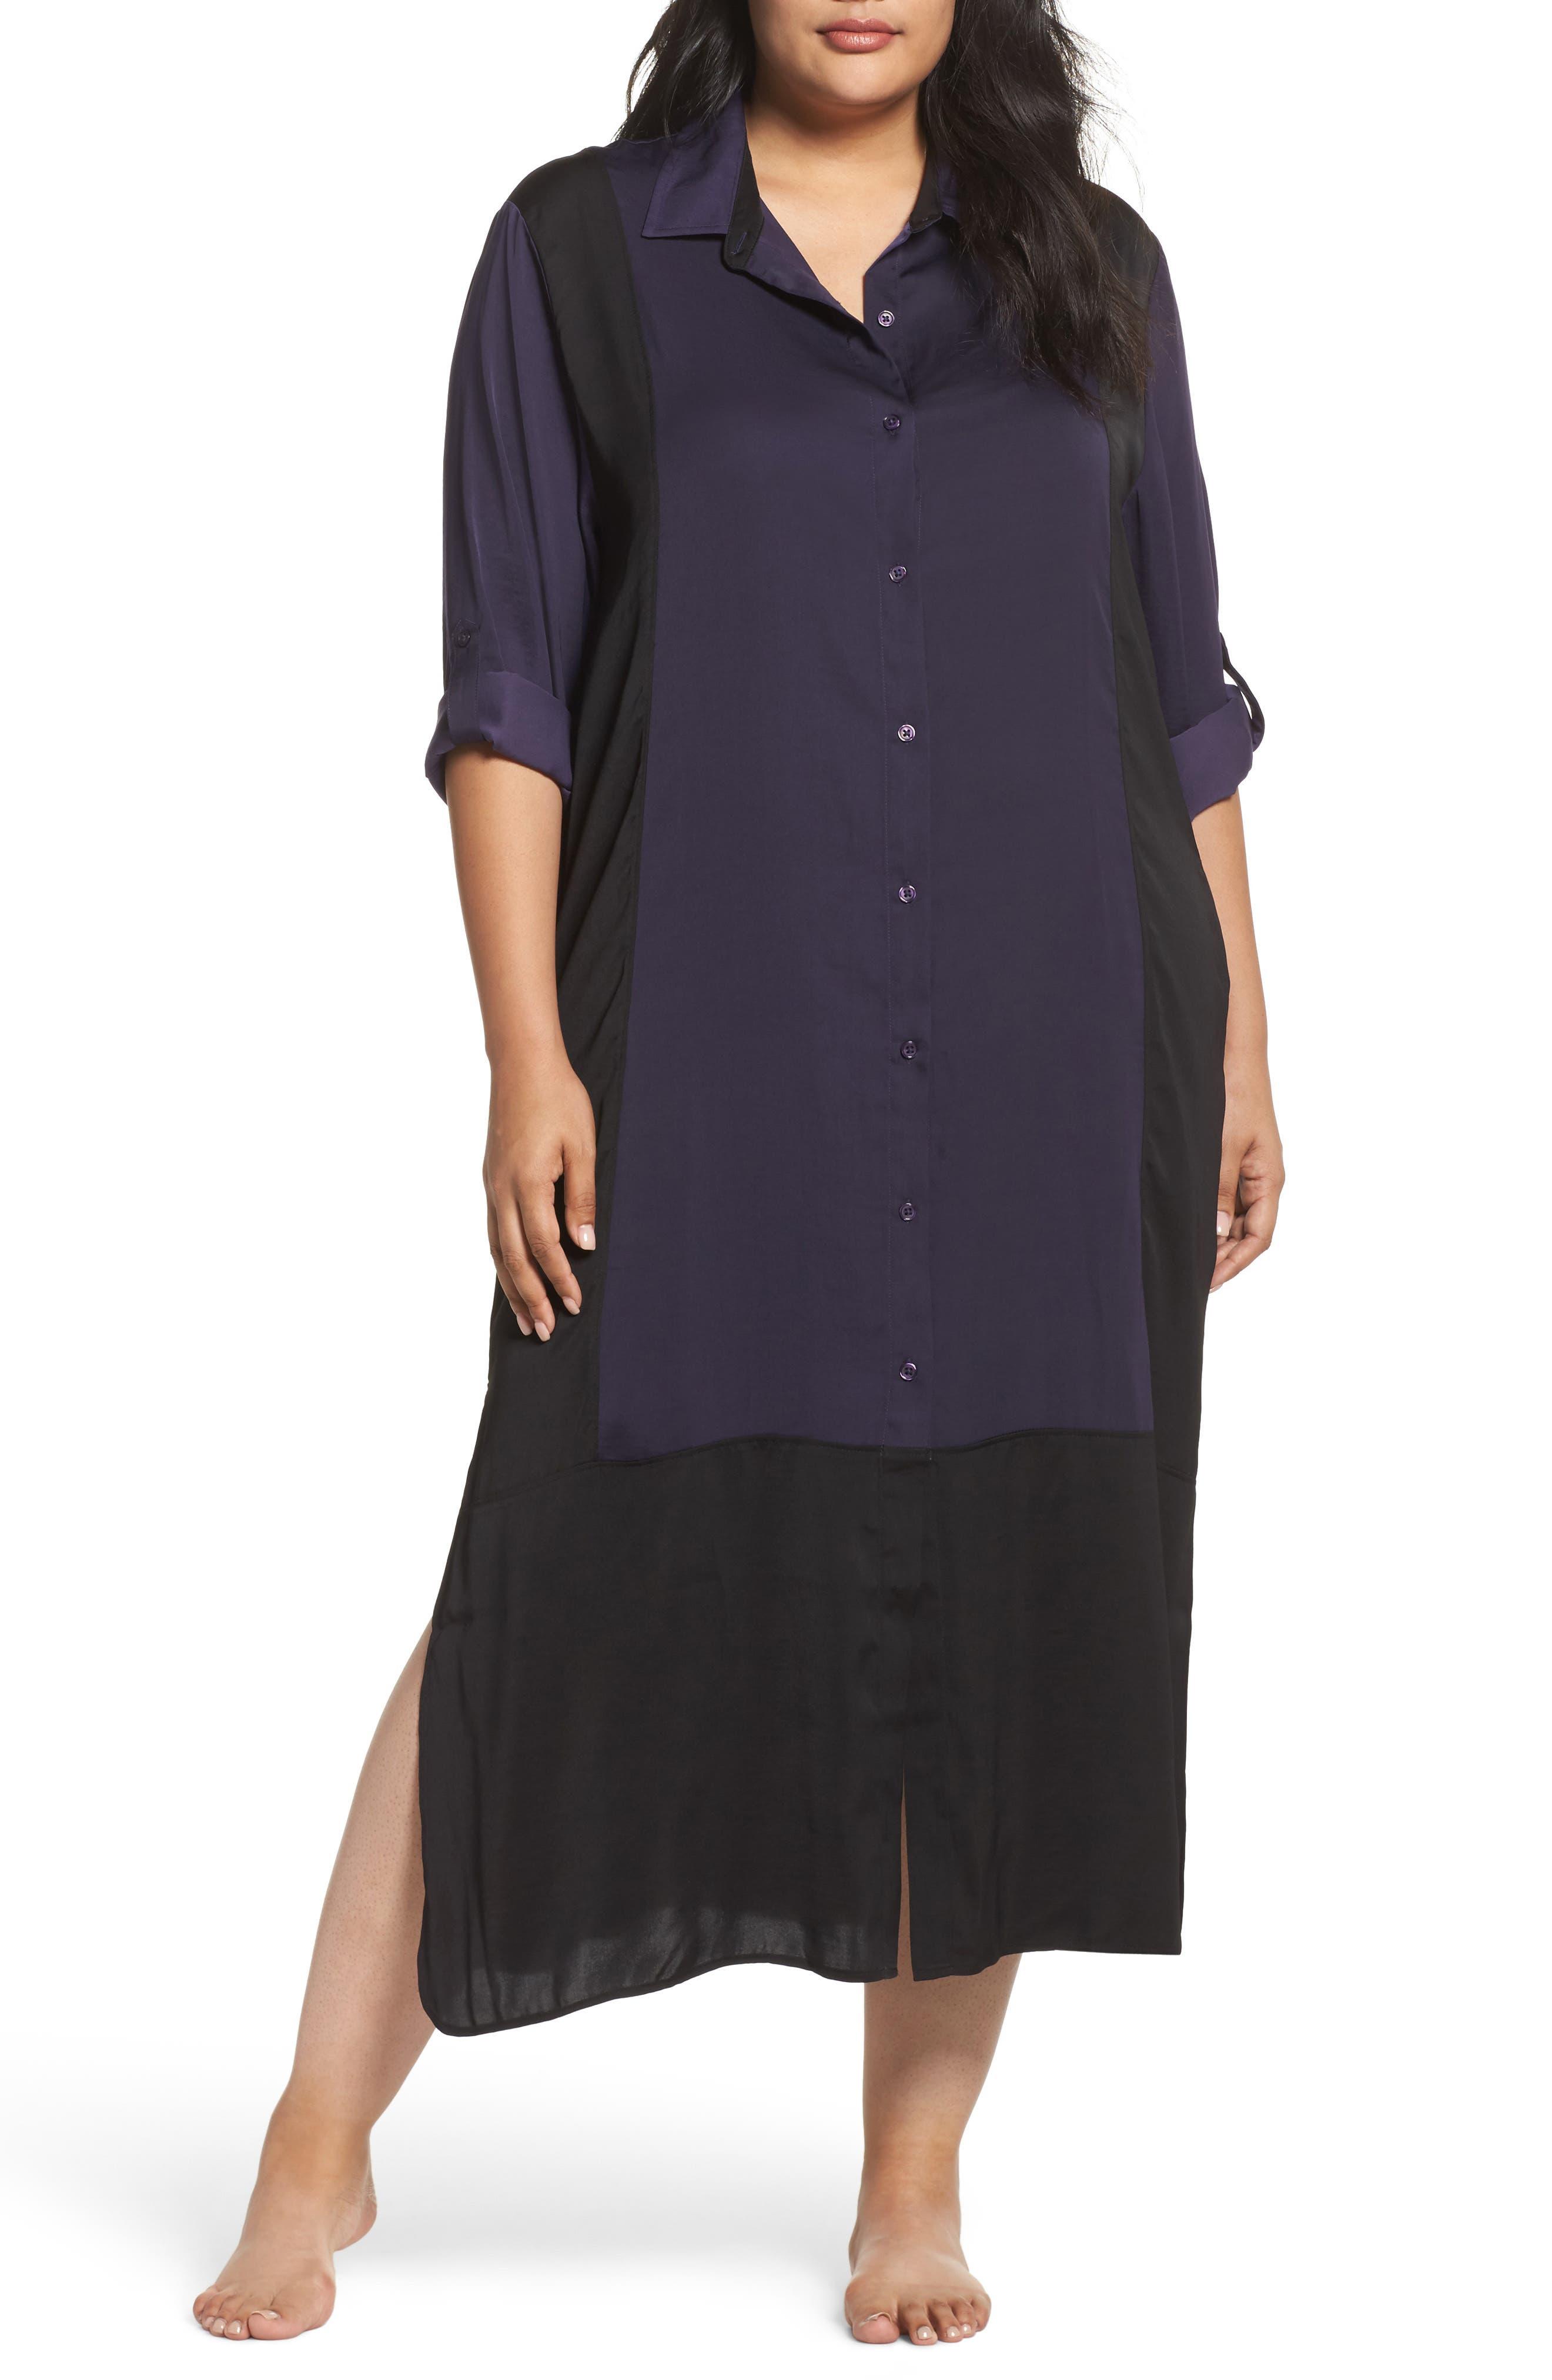 Alternate Image 1 Selected - DKNY Satin Maxi Sleep Shirt (Plus Size)